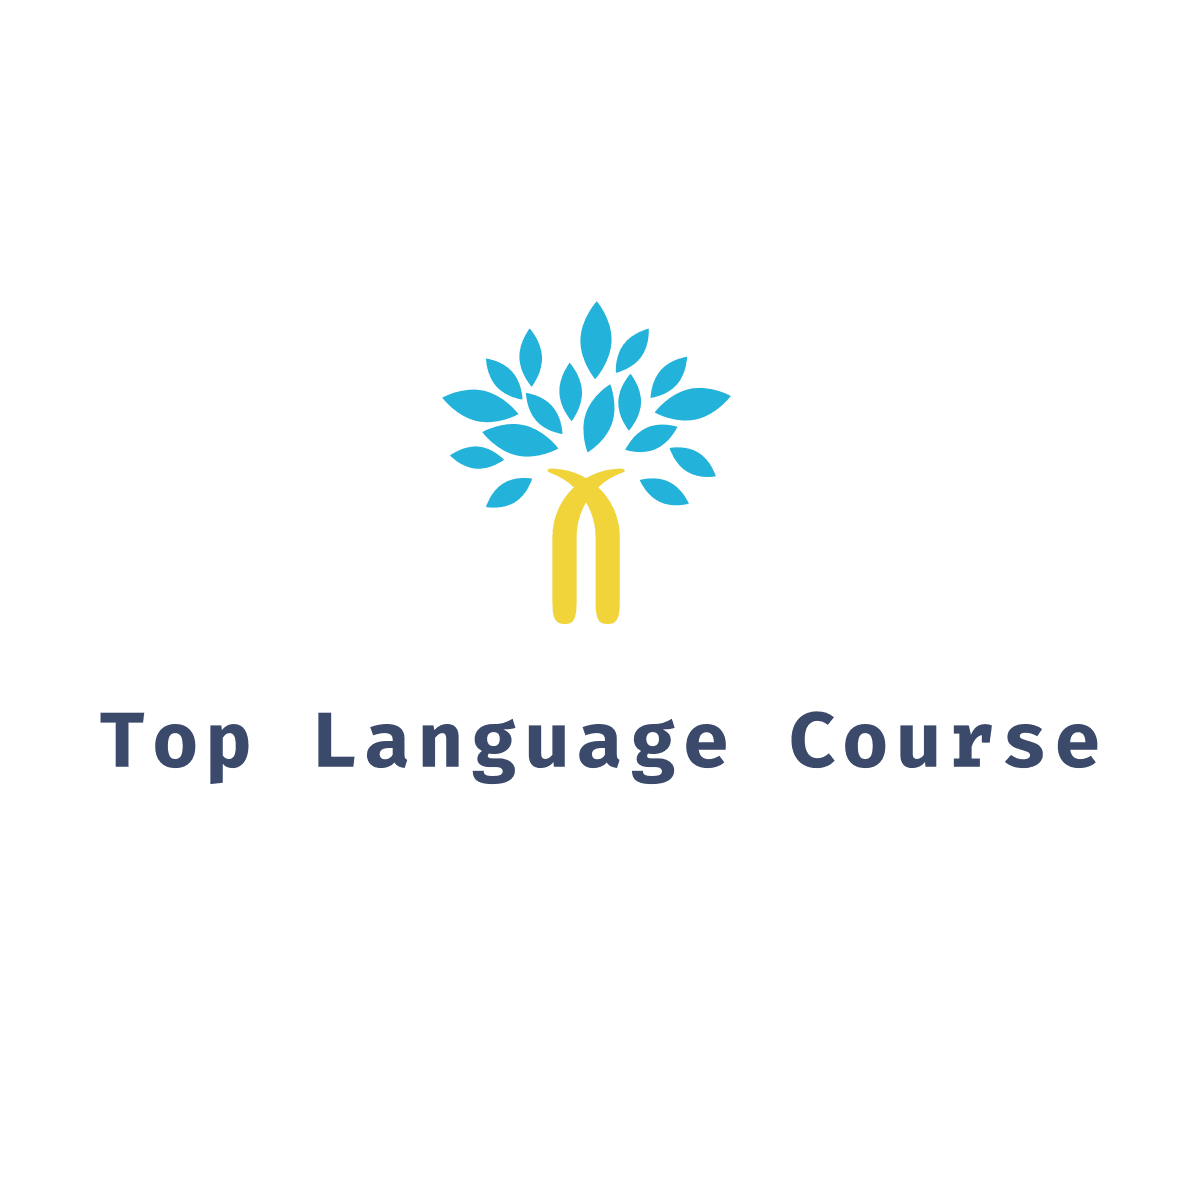 Top Language Course